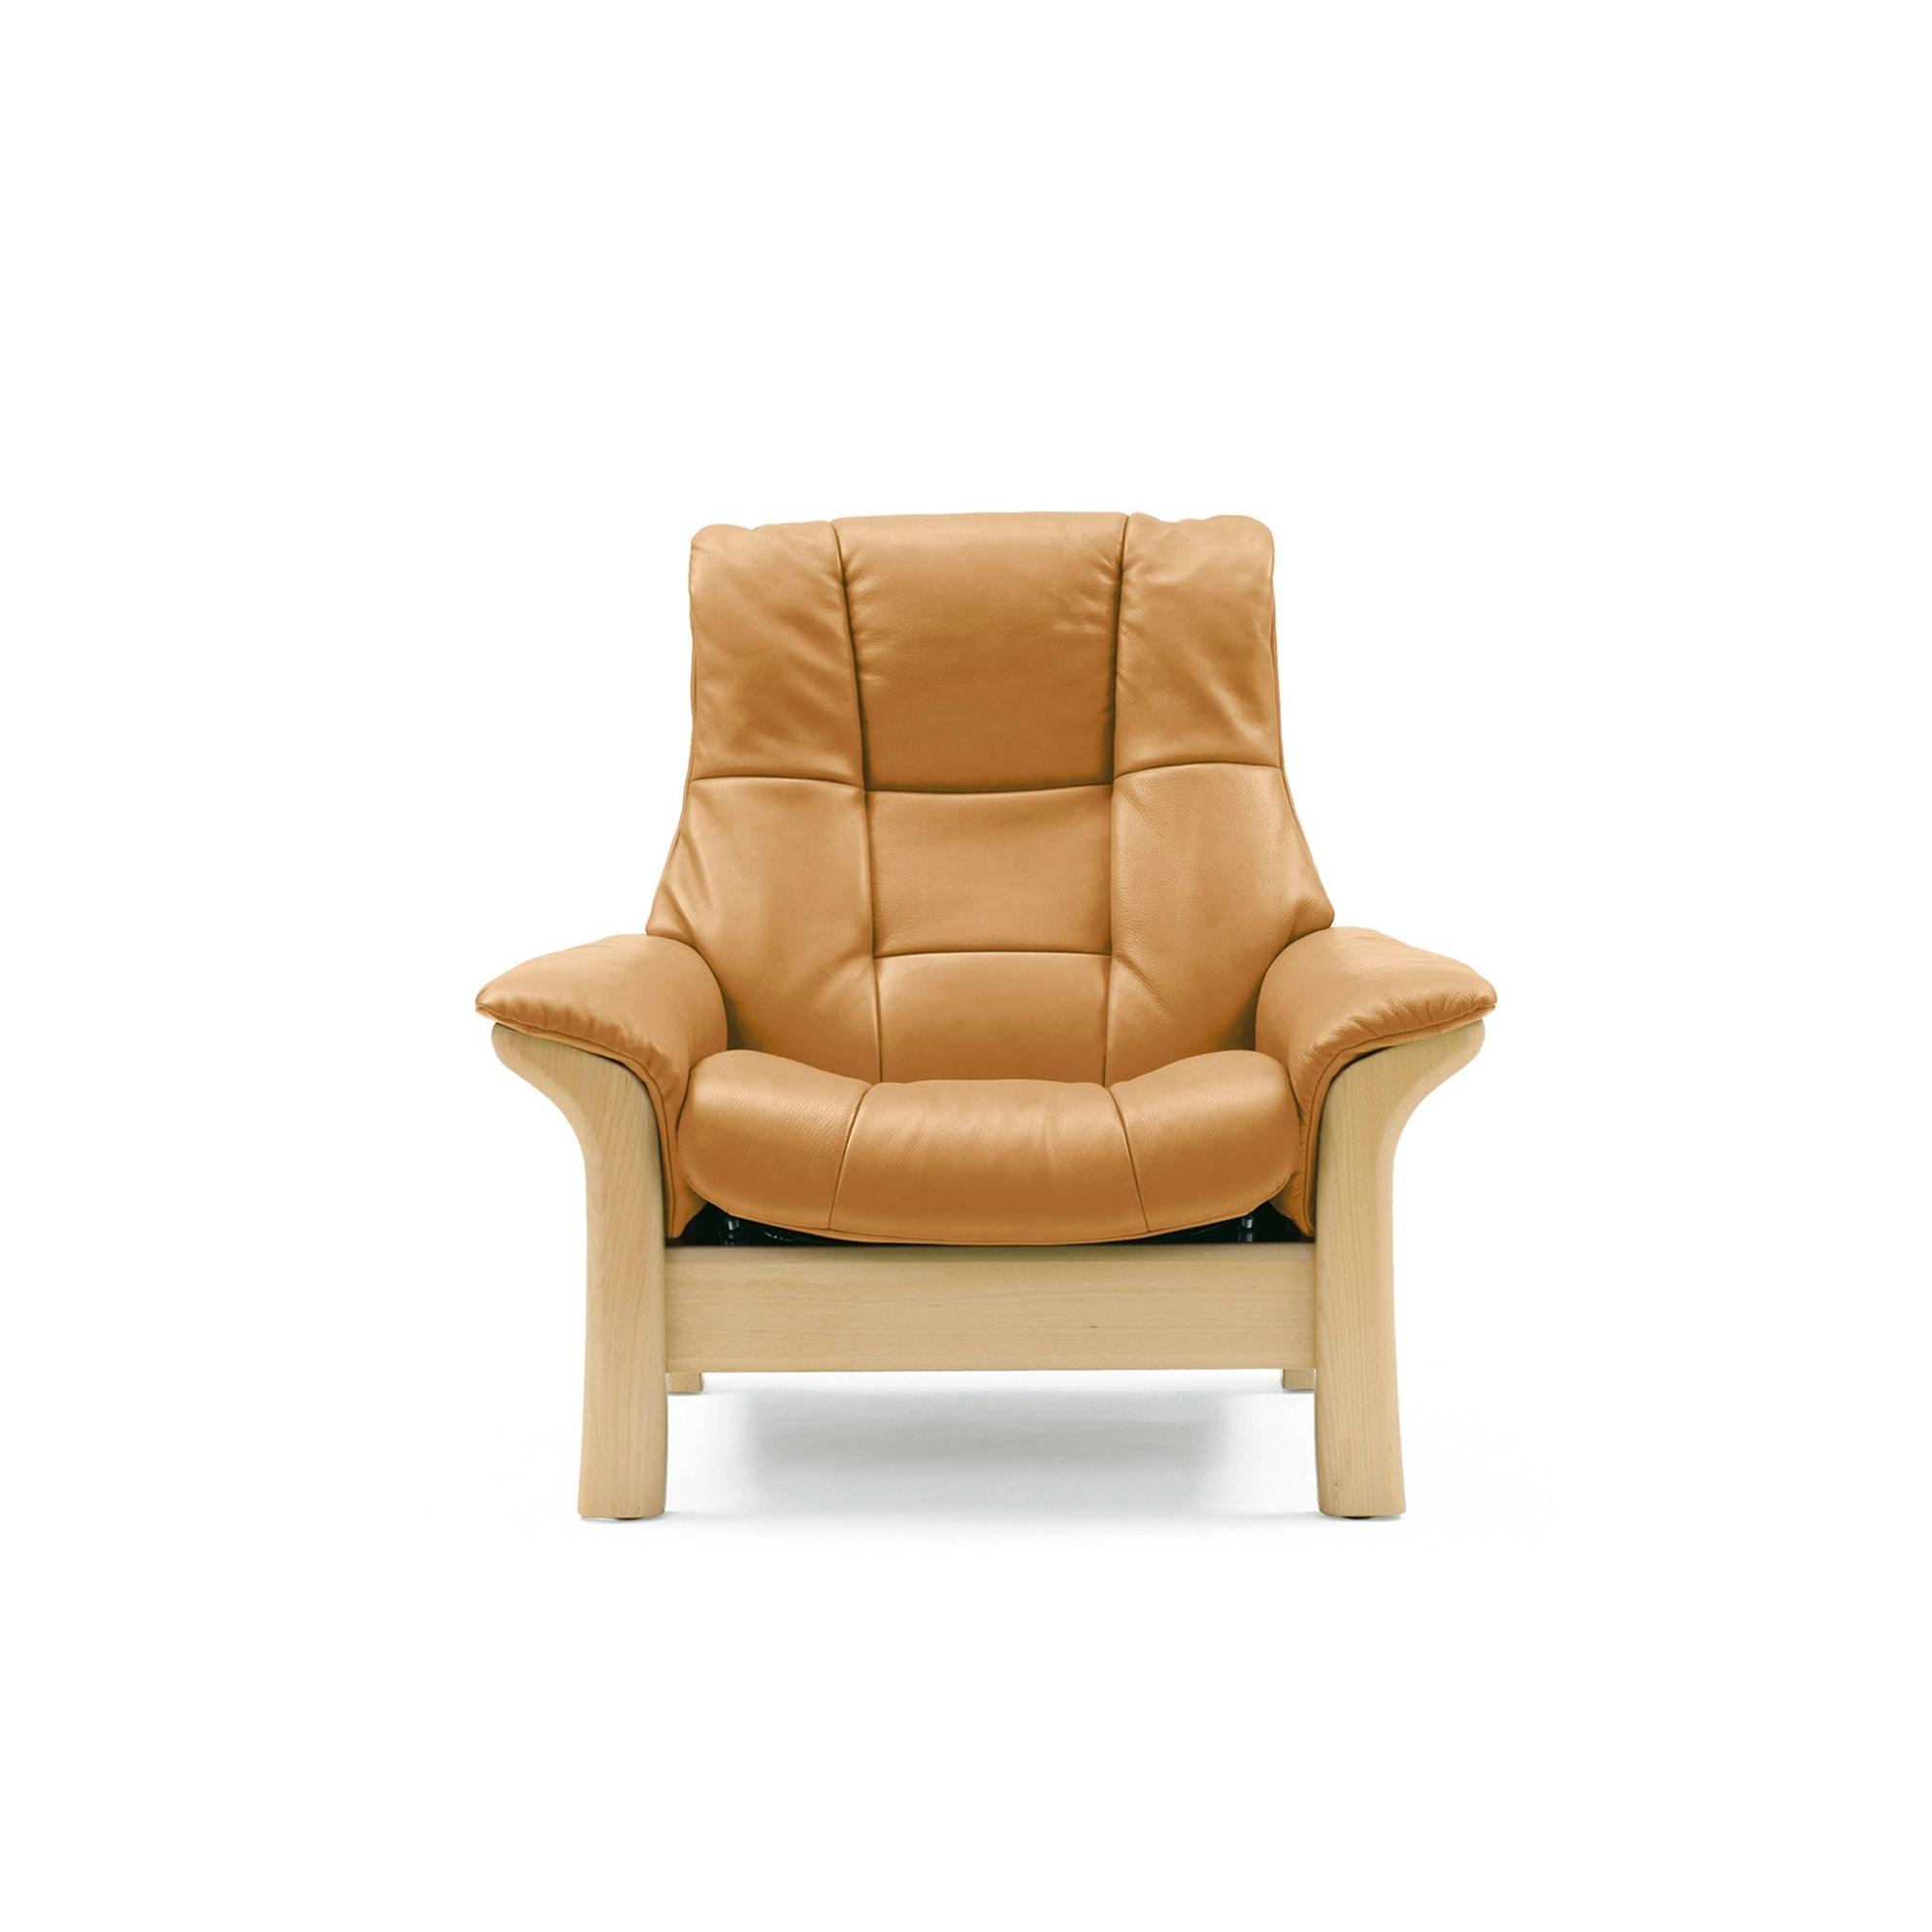 Stressless Buckingham Armchair - Cookes Furniture